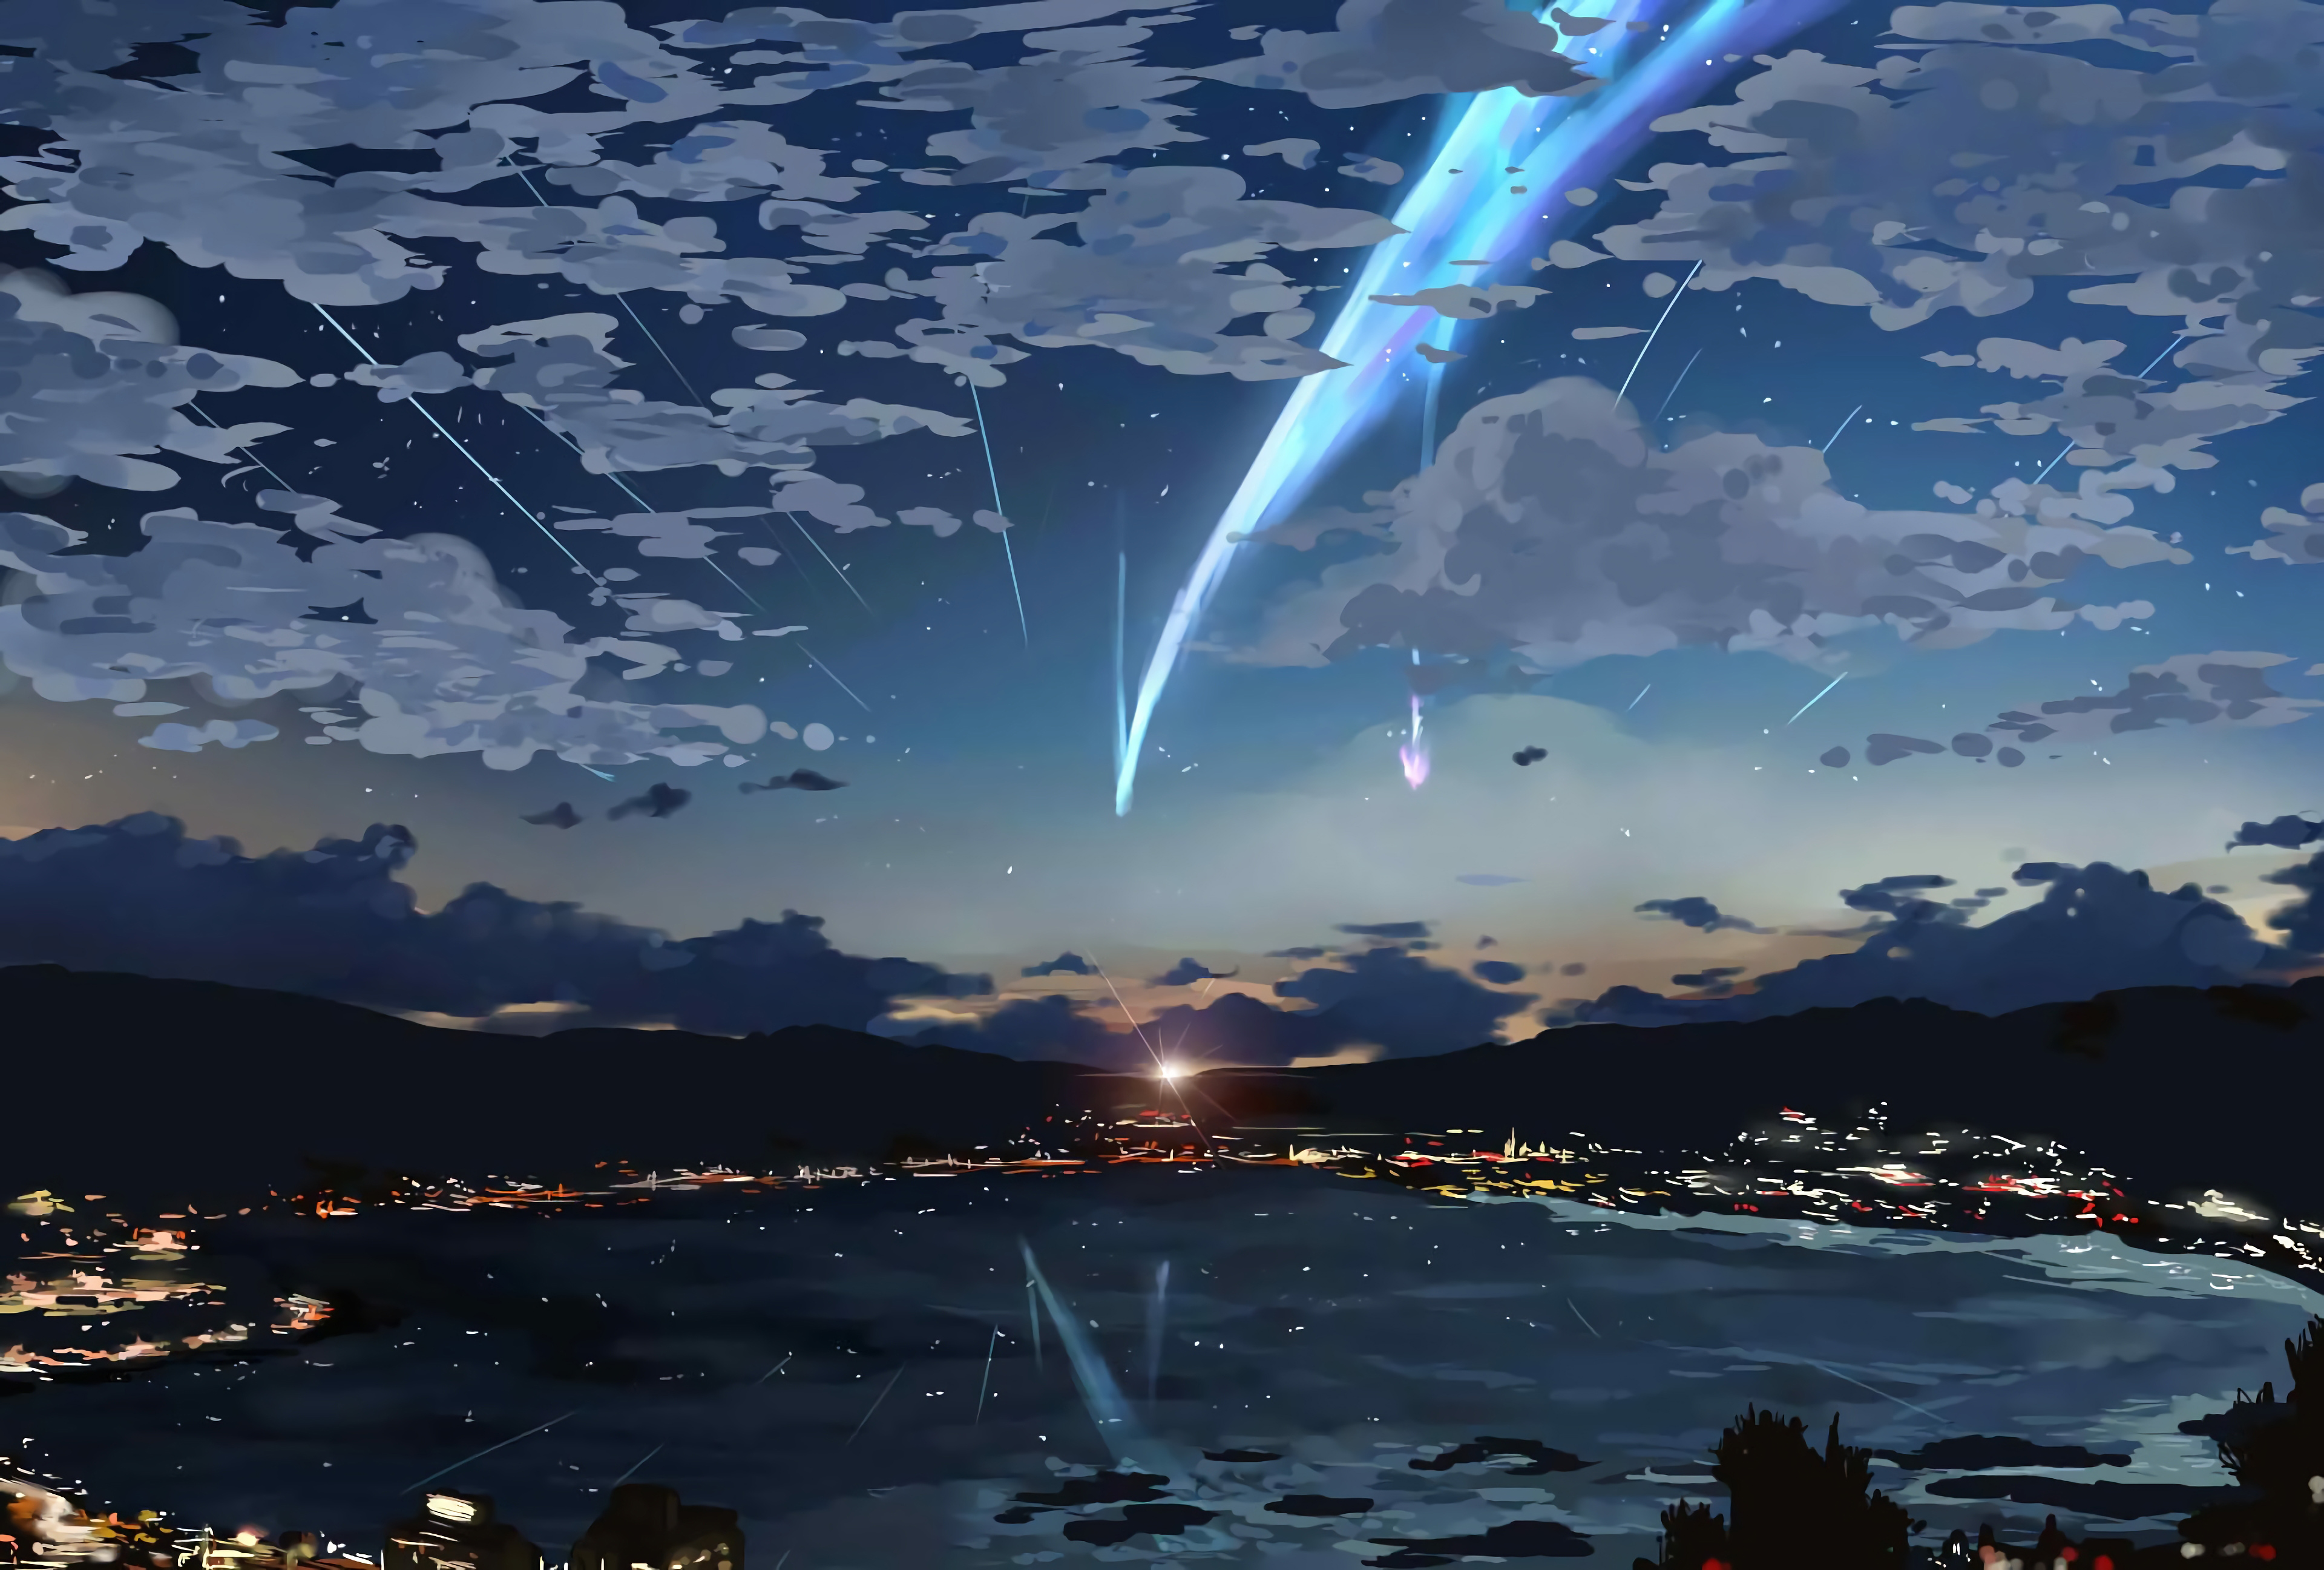 anime sky 1578253920 - Anime Sky -